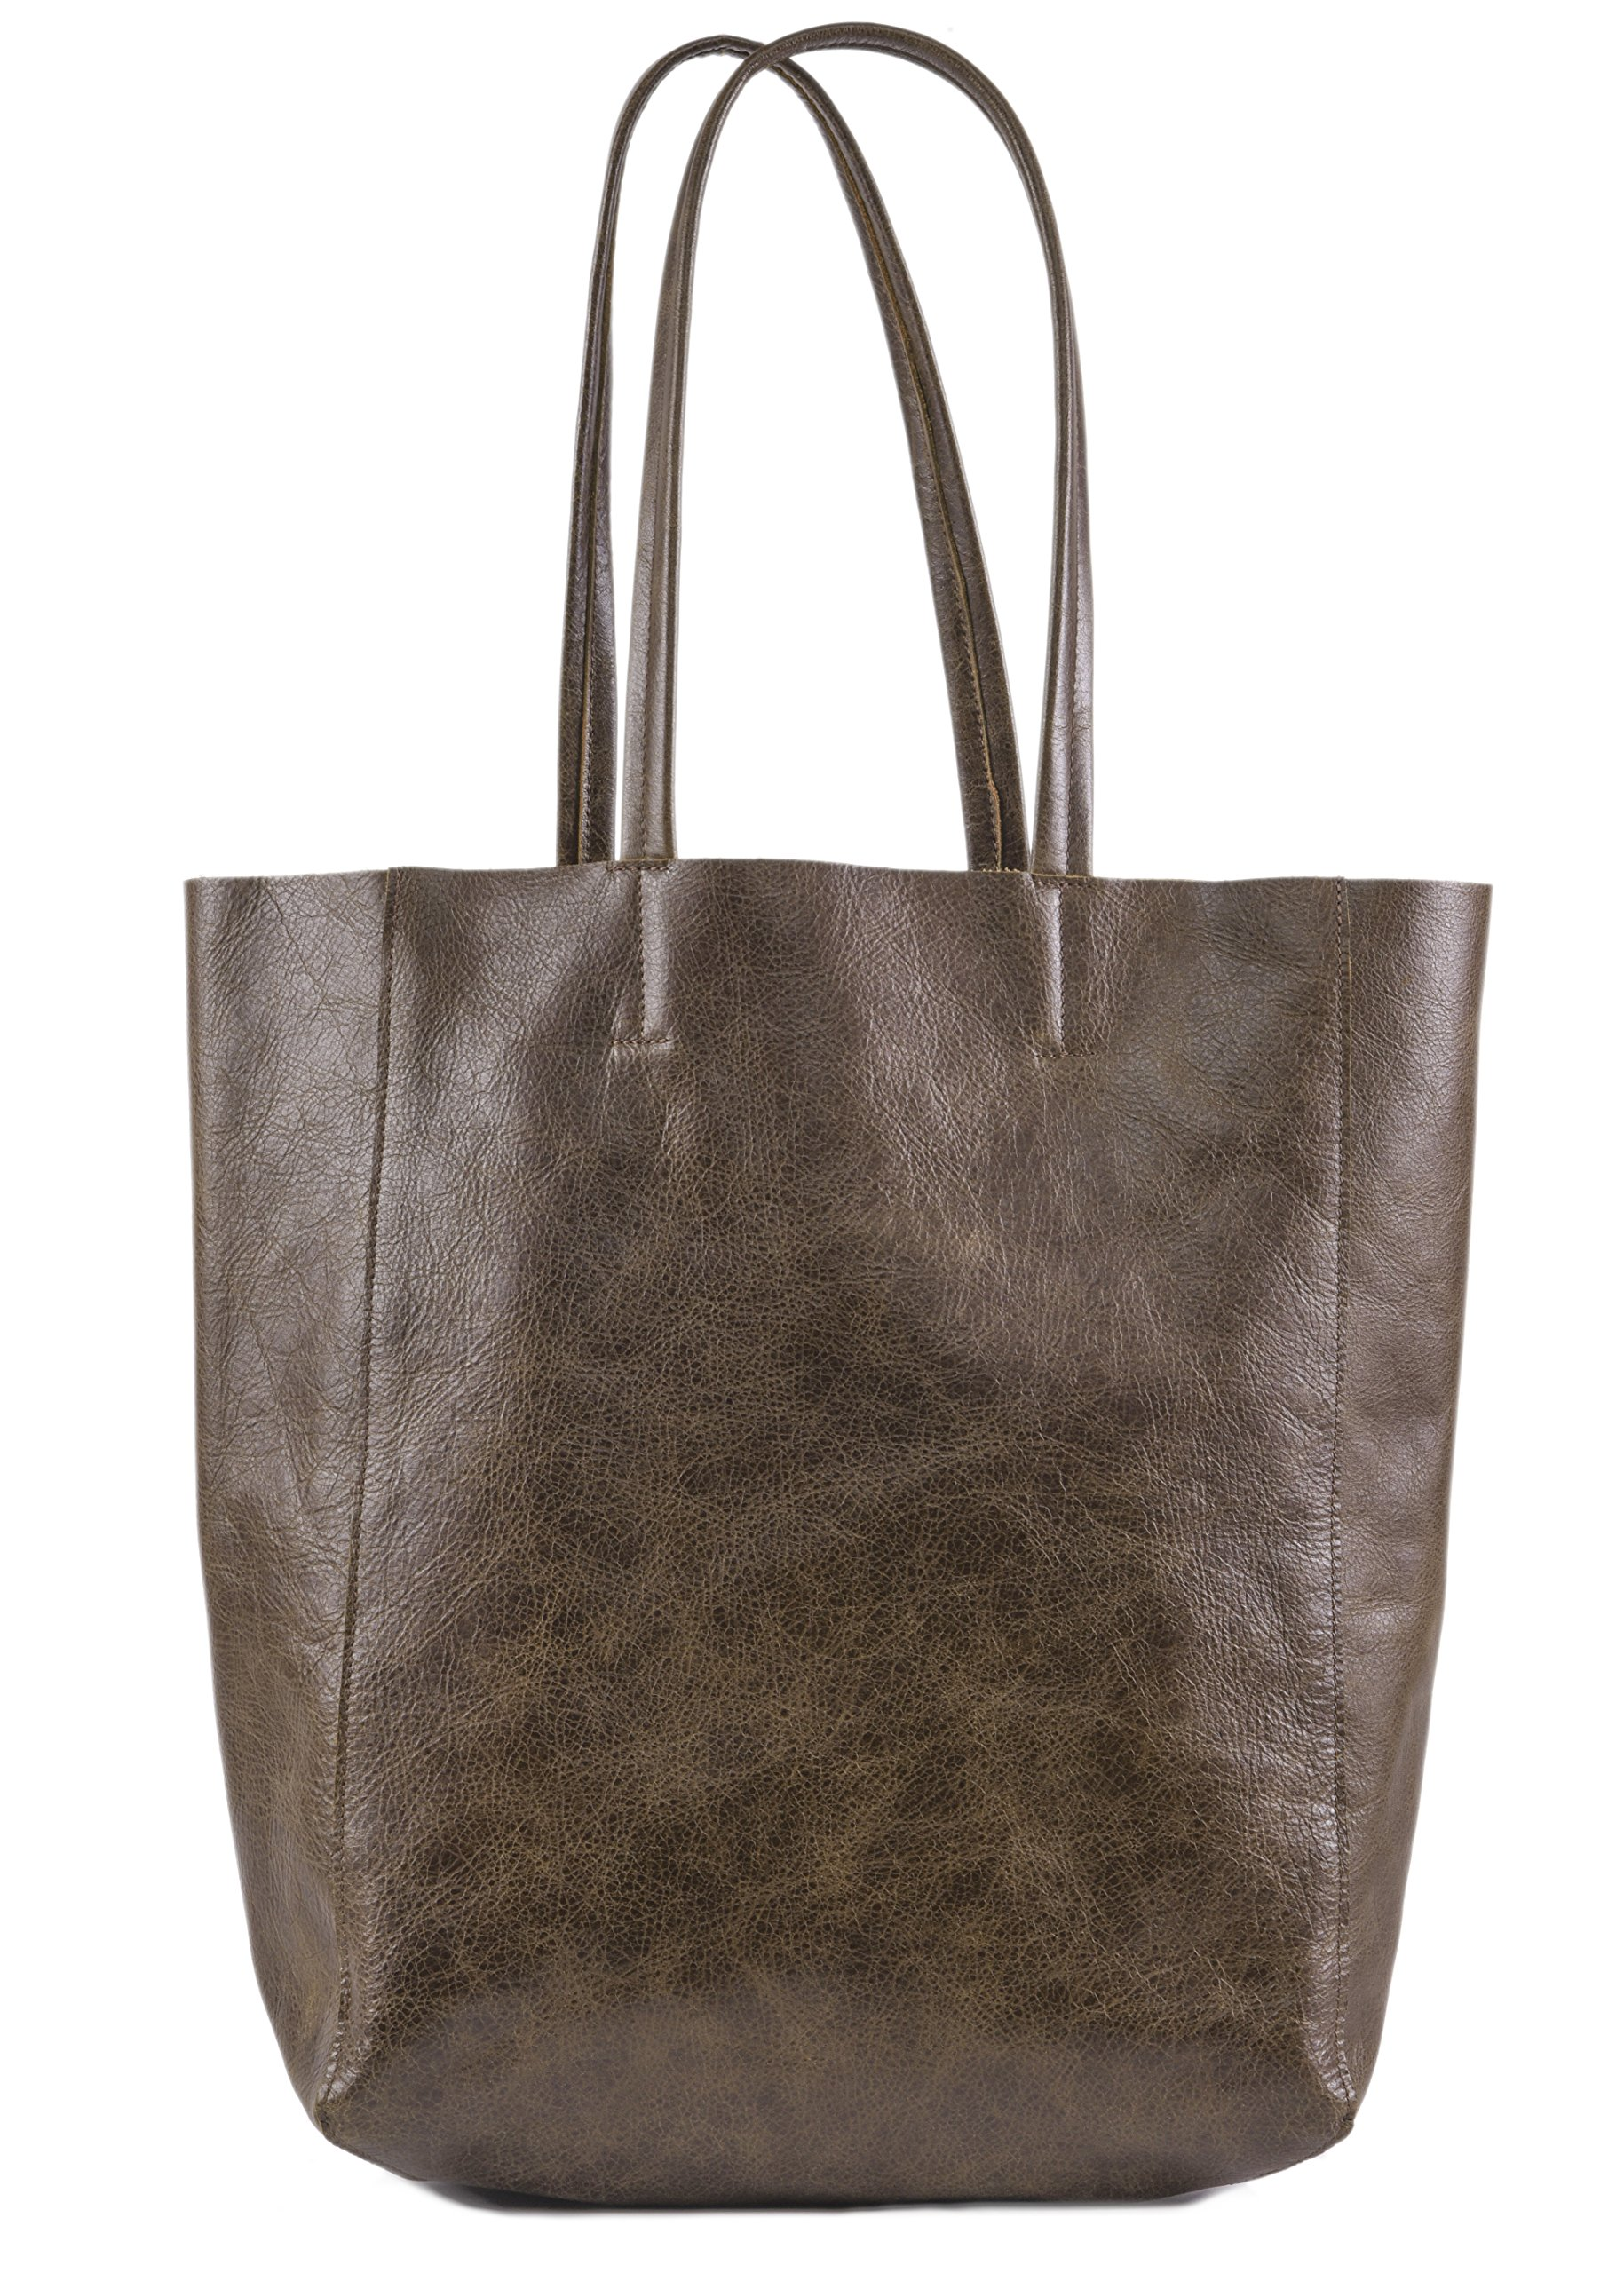 Women's Vintage Genuine Leather Tote Shoulder Bag - Large Capacity Travel Handbag by THE AARTISAN (Image #2)